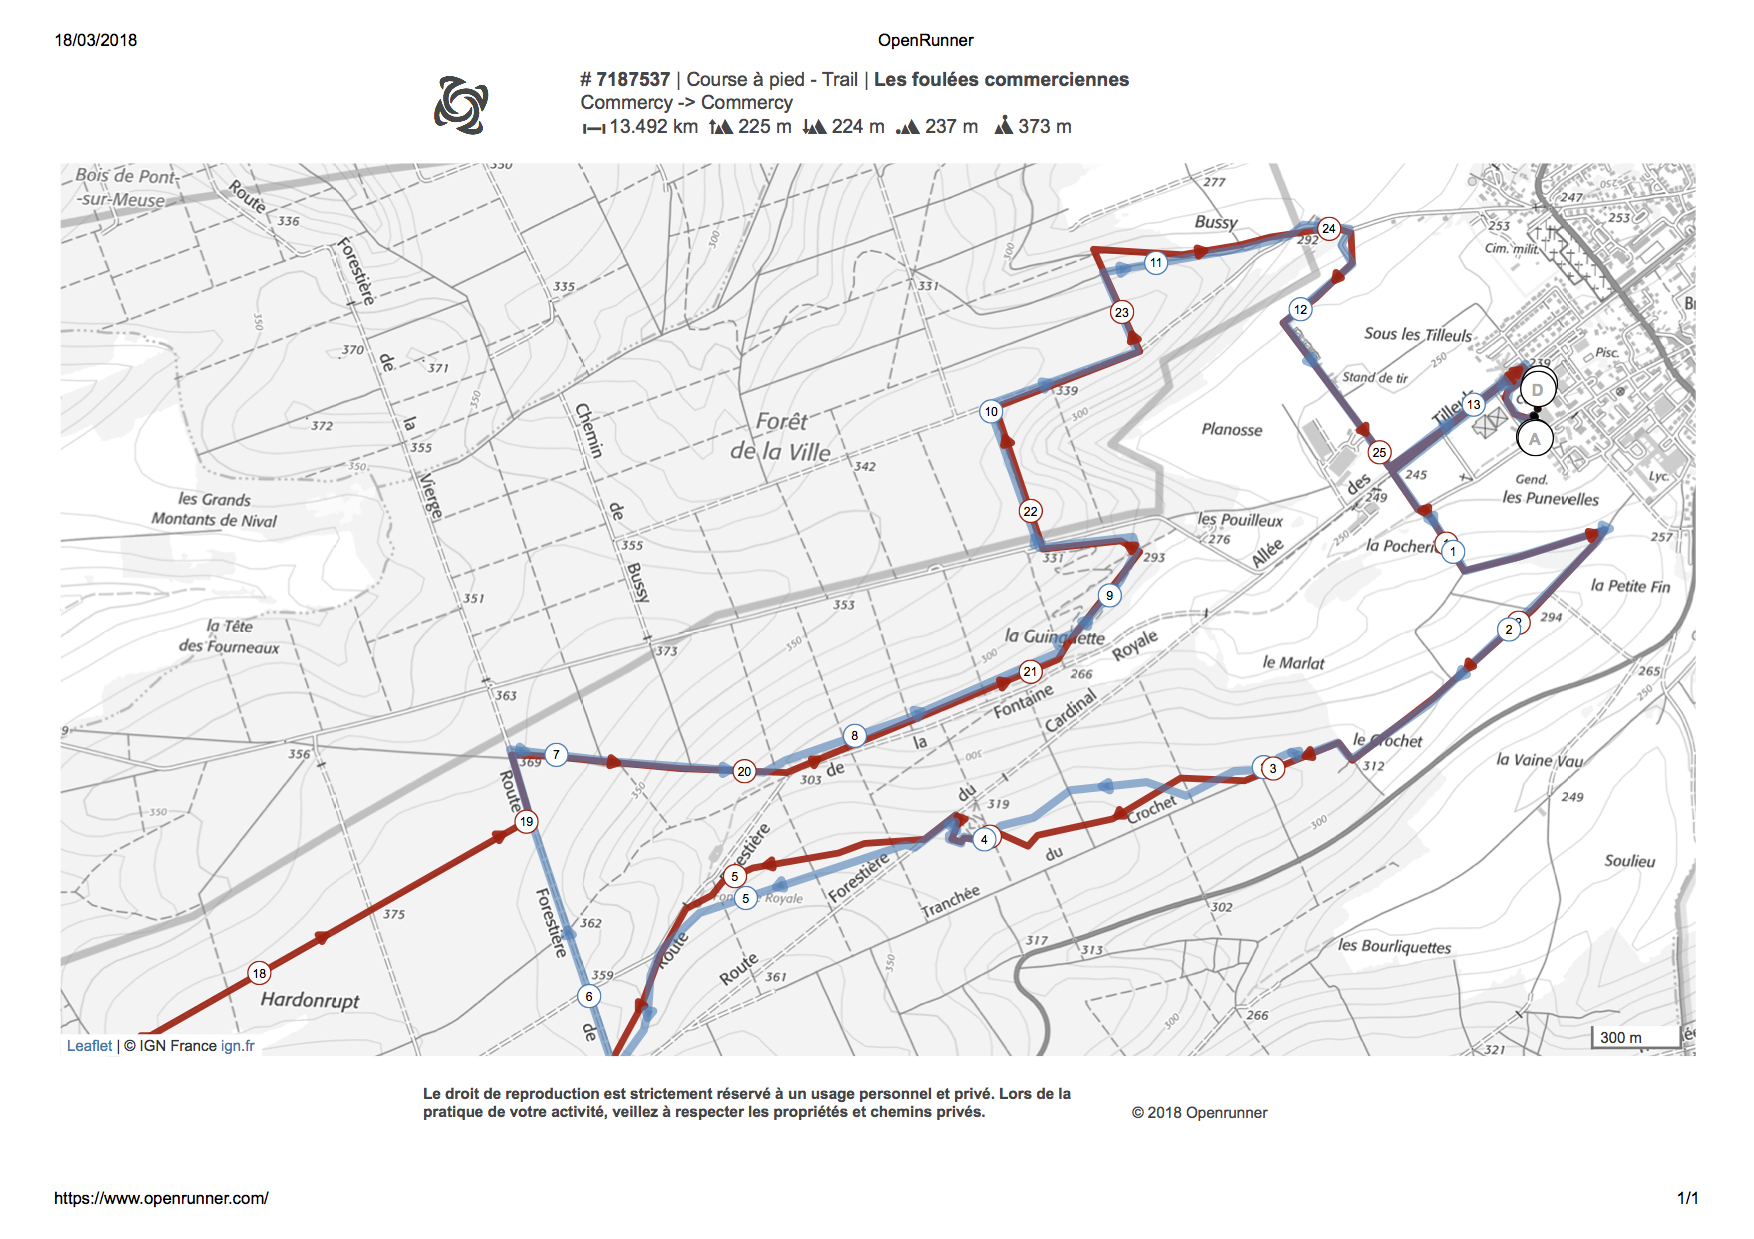 Trai de la Madeleine 13,500 KM